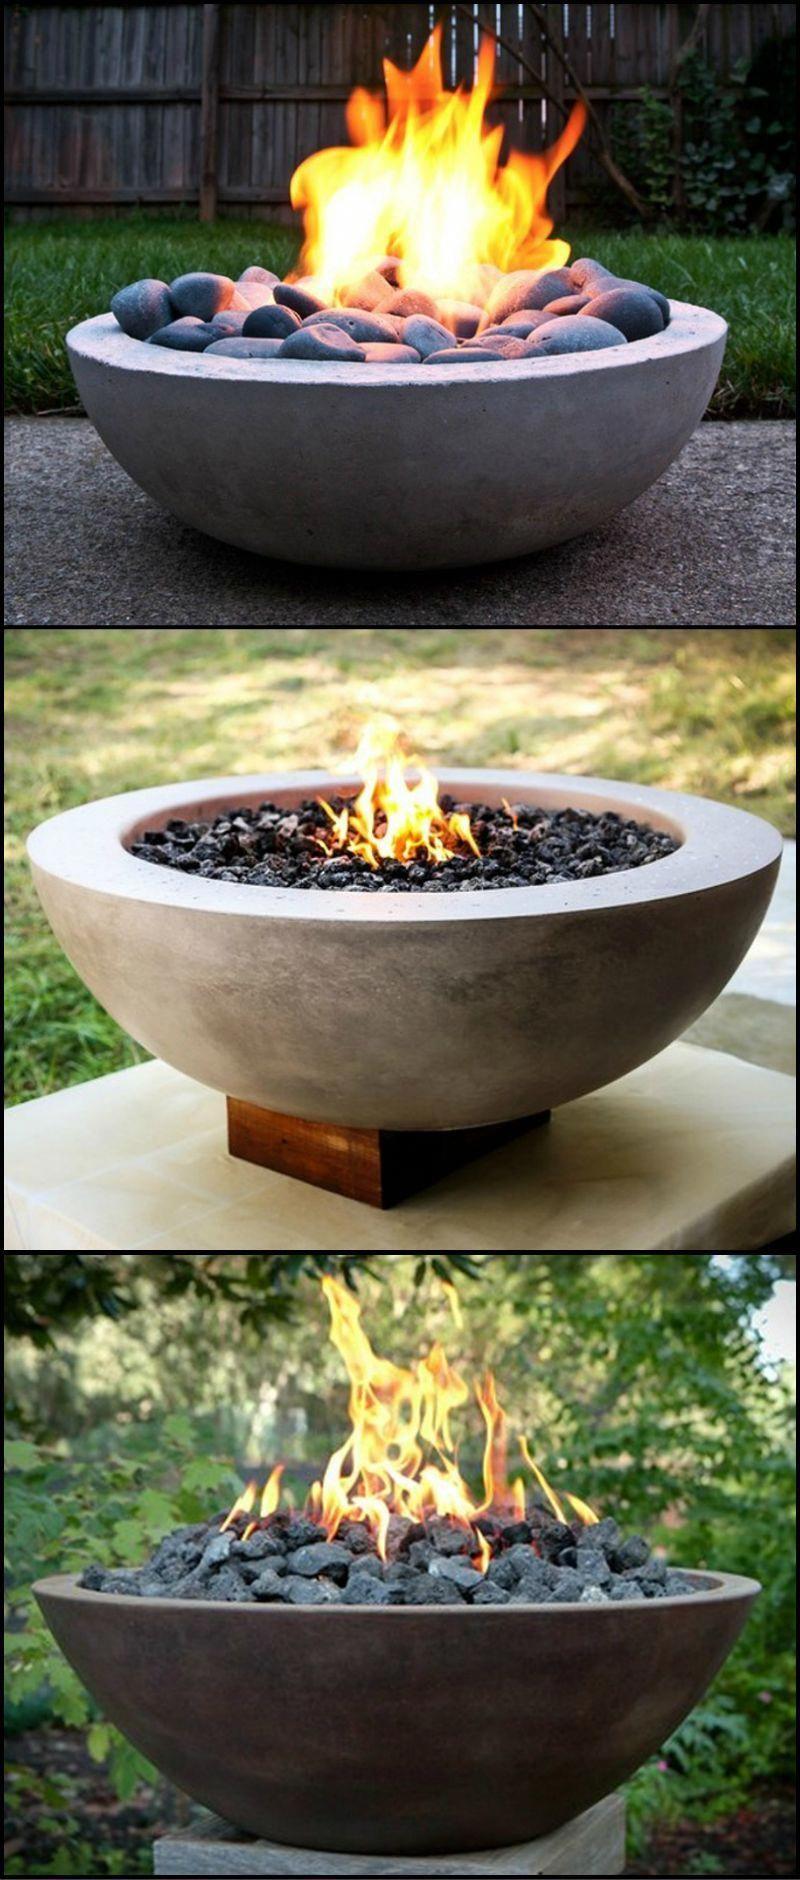 27 Easy Diy Bbq Fire Pit Ideas Anyone Can Make   Beton ...